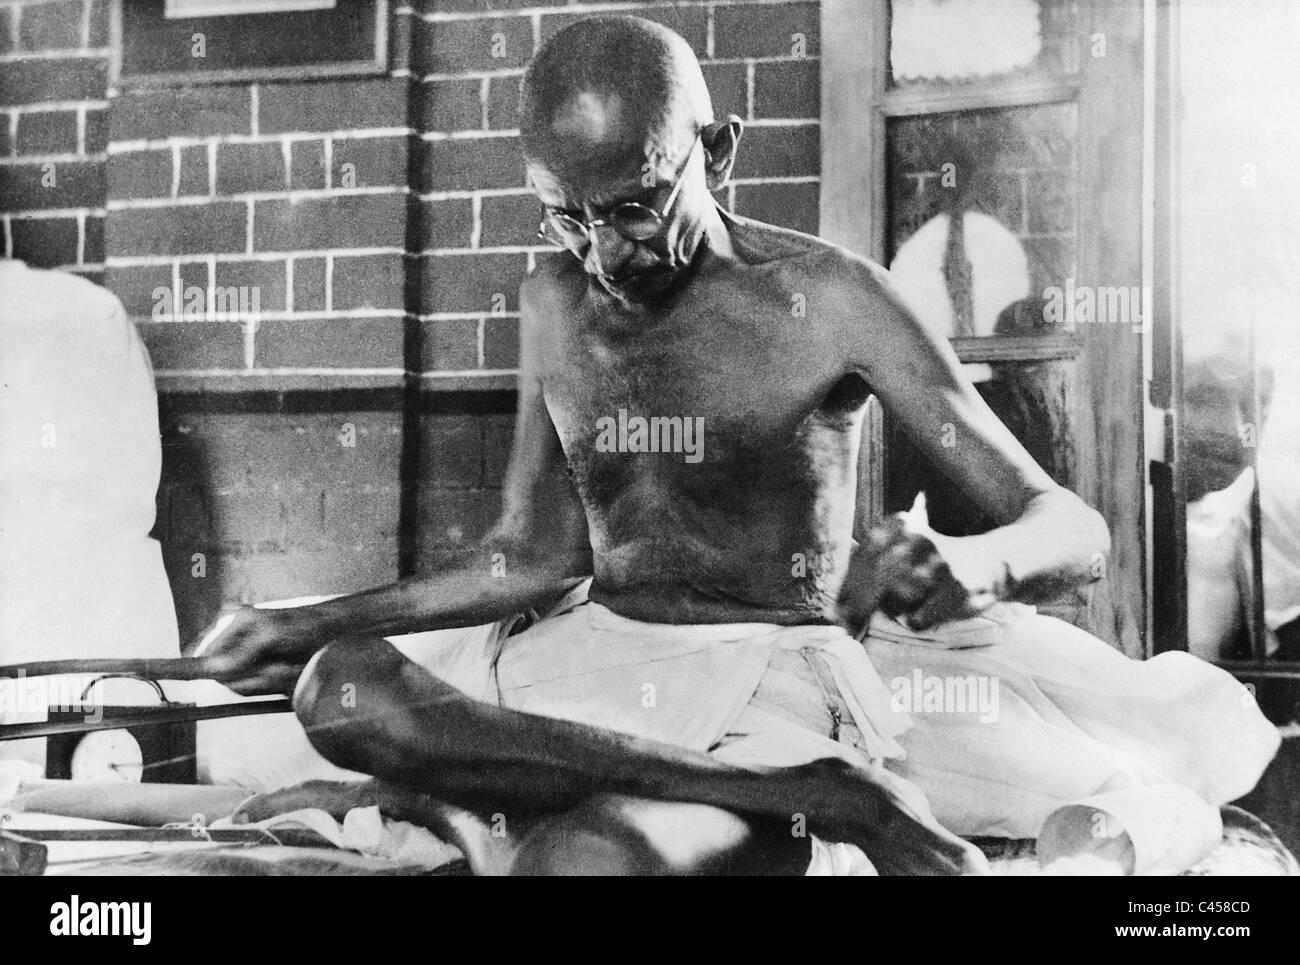 Mahatma Gandhi weaving, 1940 - Stock Image